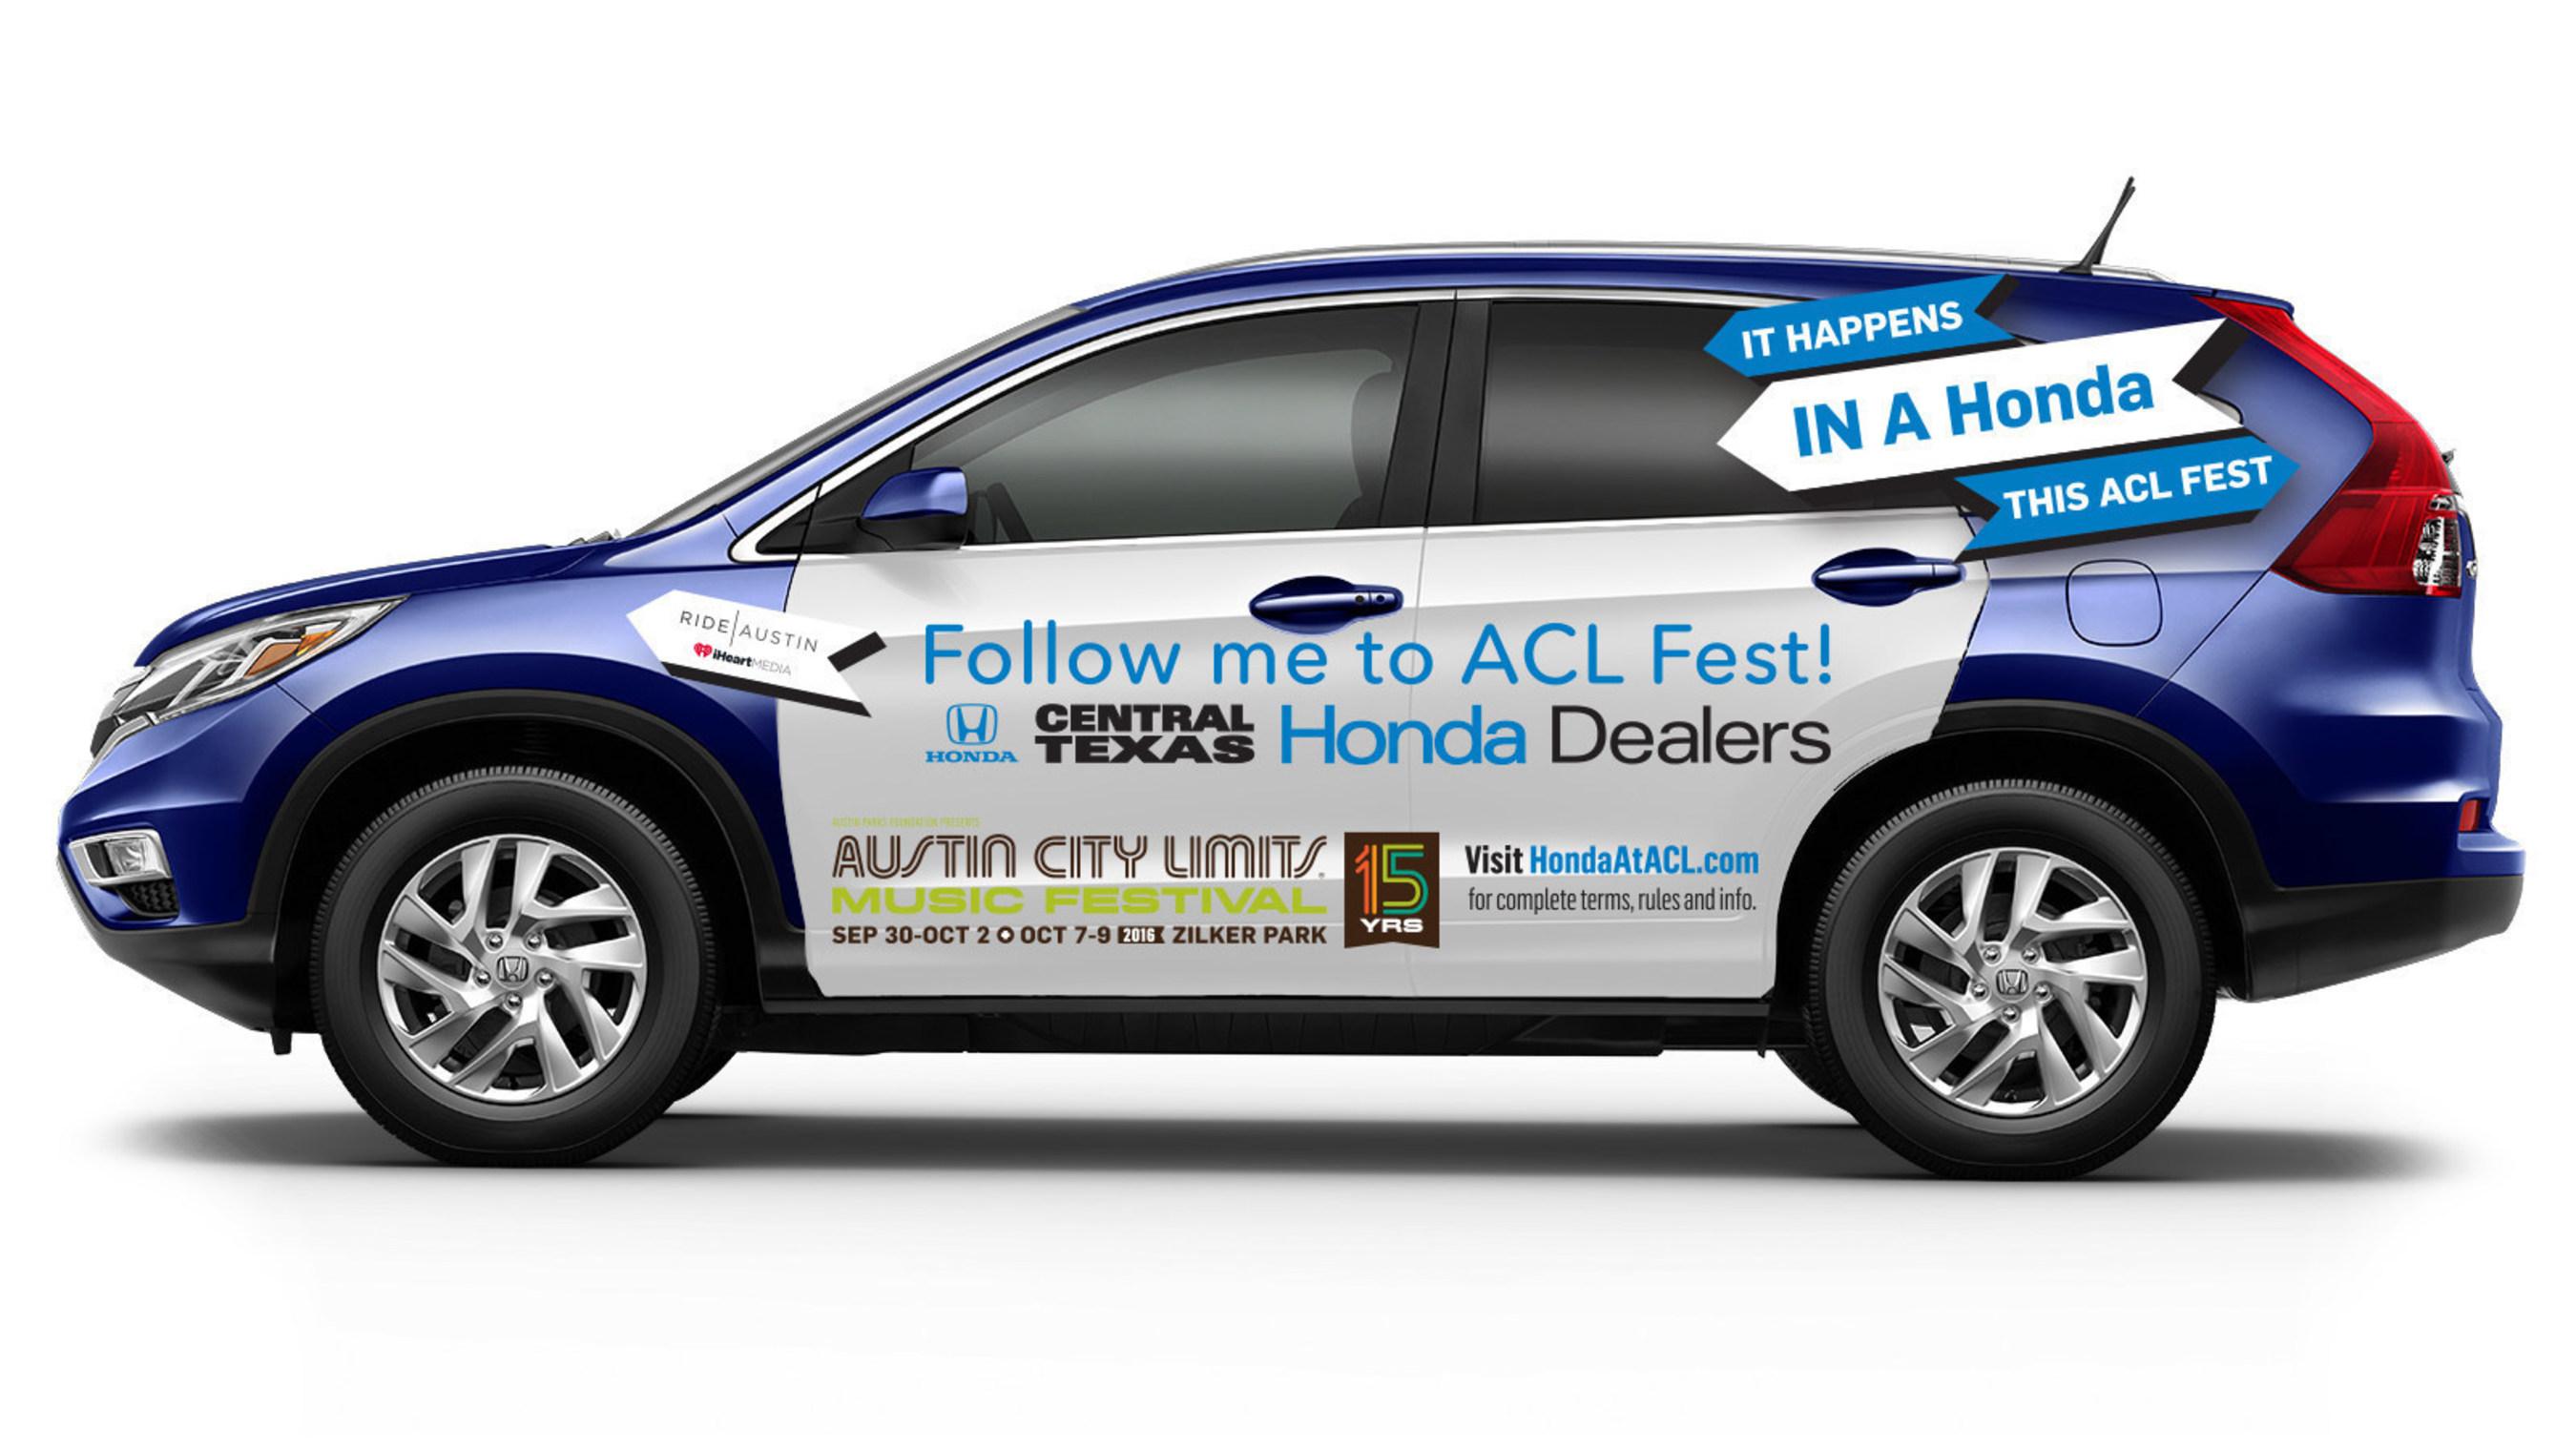 'Hail A Honda' Rideshare Program Comes to Austin City Limits Music Festival Thanks to Honda and the Central Texas Honda Dealers